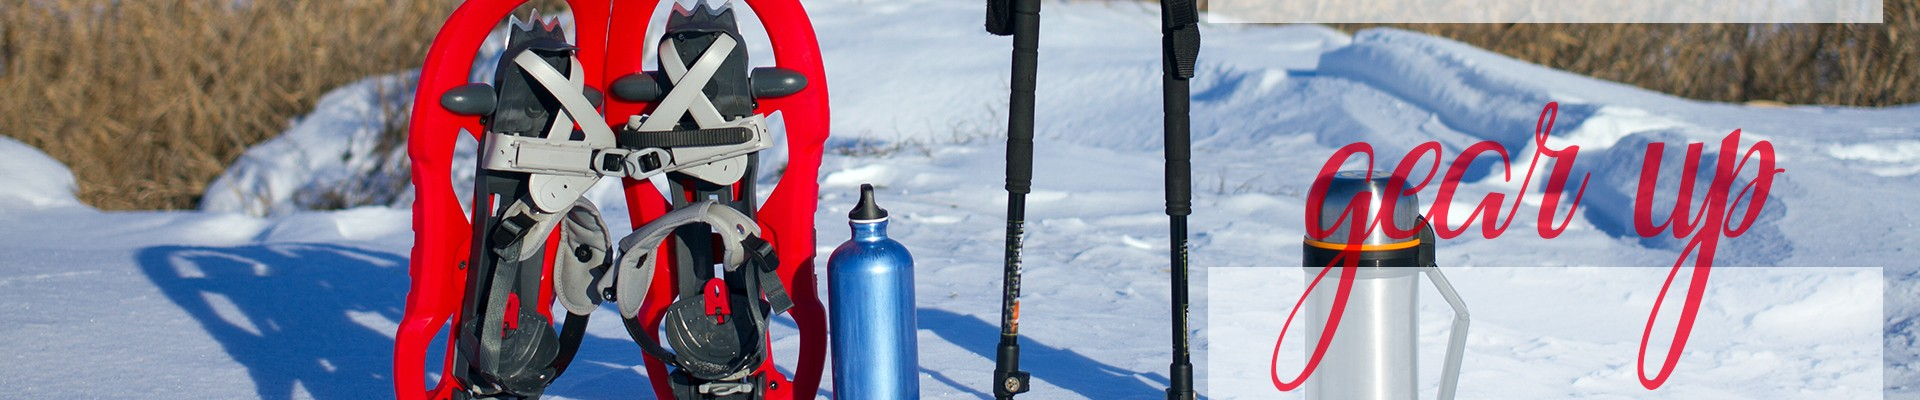 Winter camping and outdoor gear checklist: Gear